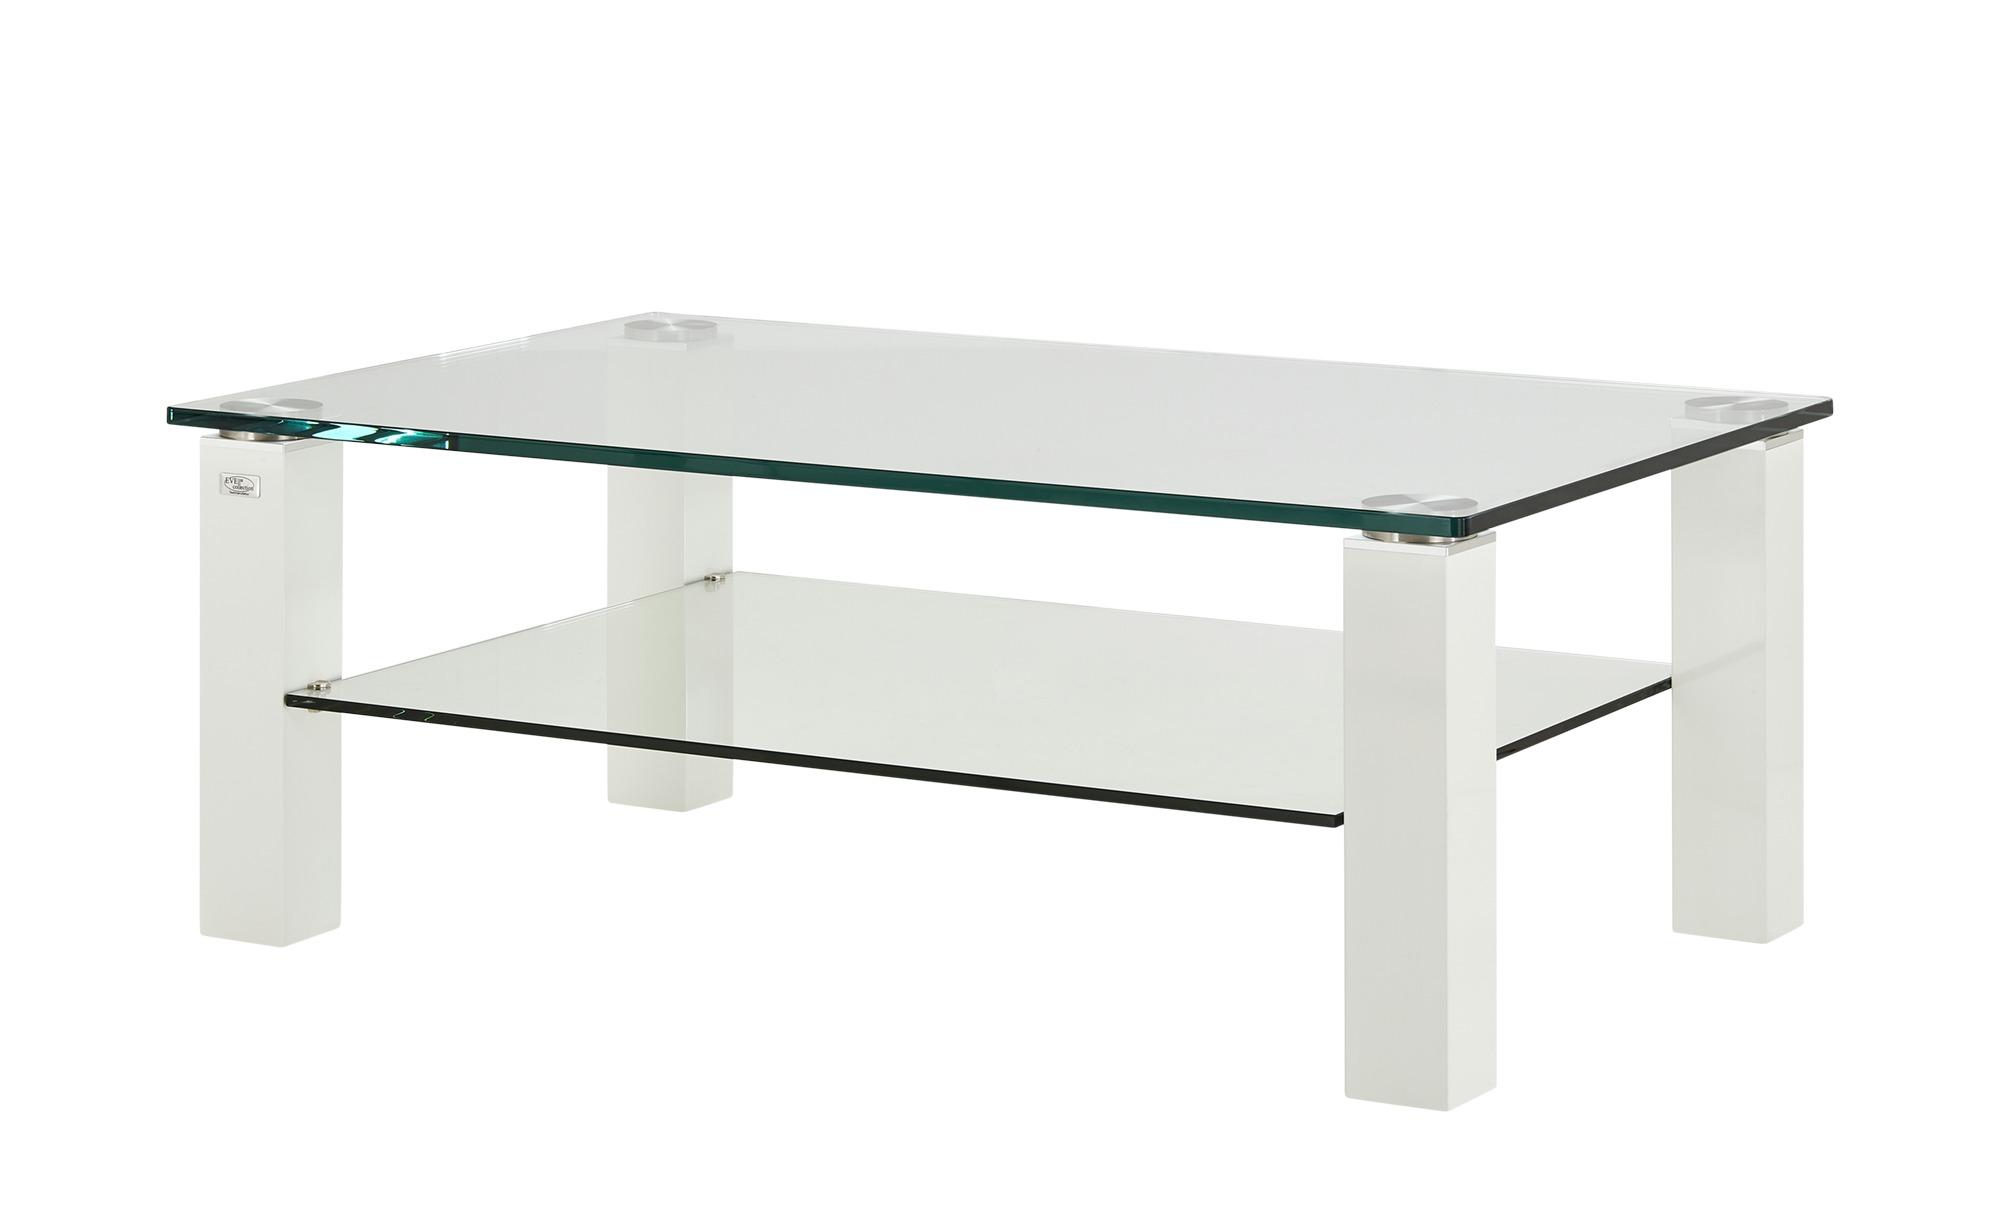 Couchtisch  Rimini ¦ Maße (cm): B: 70 H: 42,5 T: 70 Tische > Couchtische > Couchtische rechteckig - Höffner